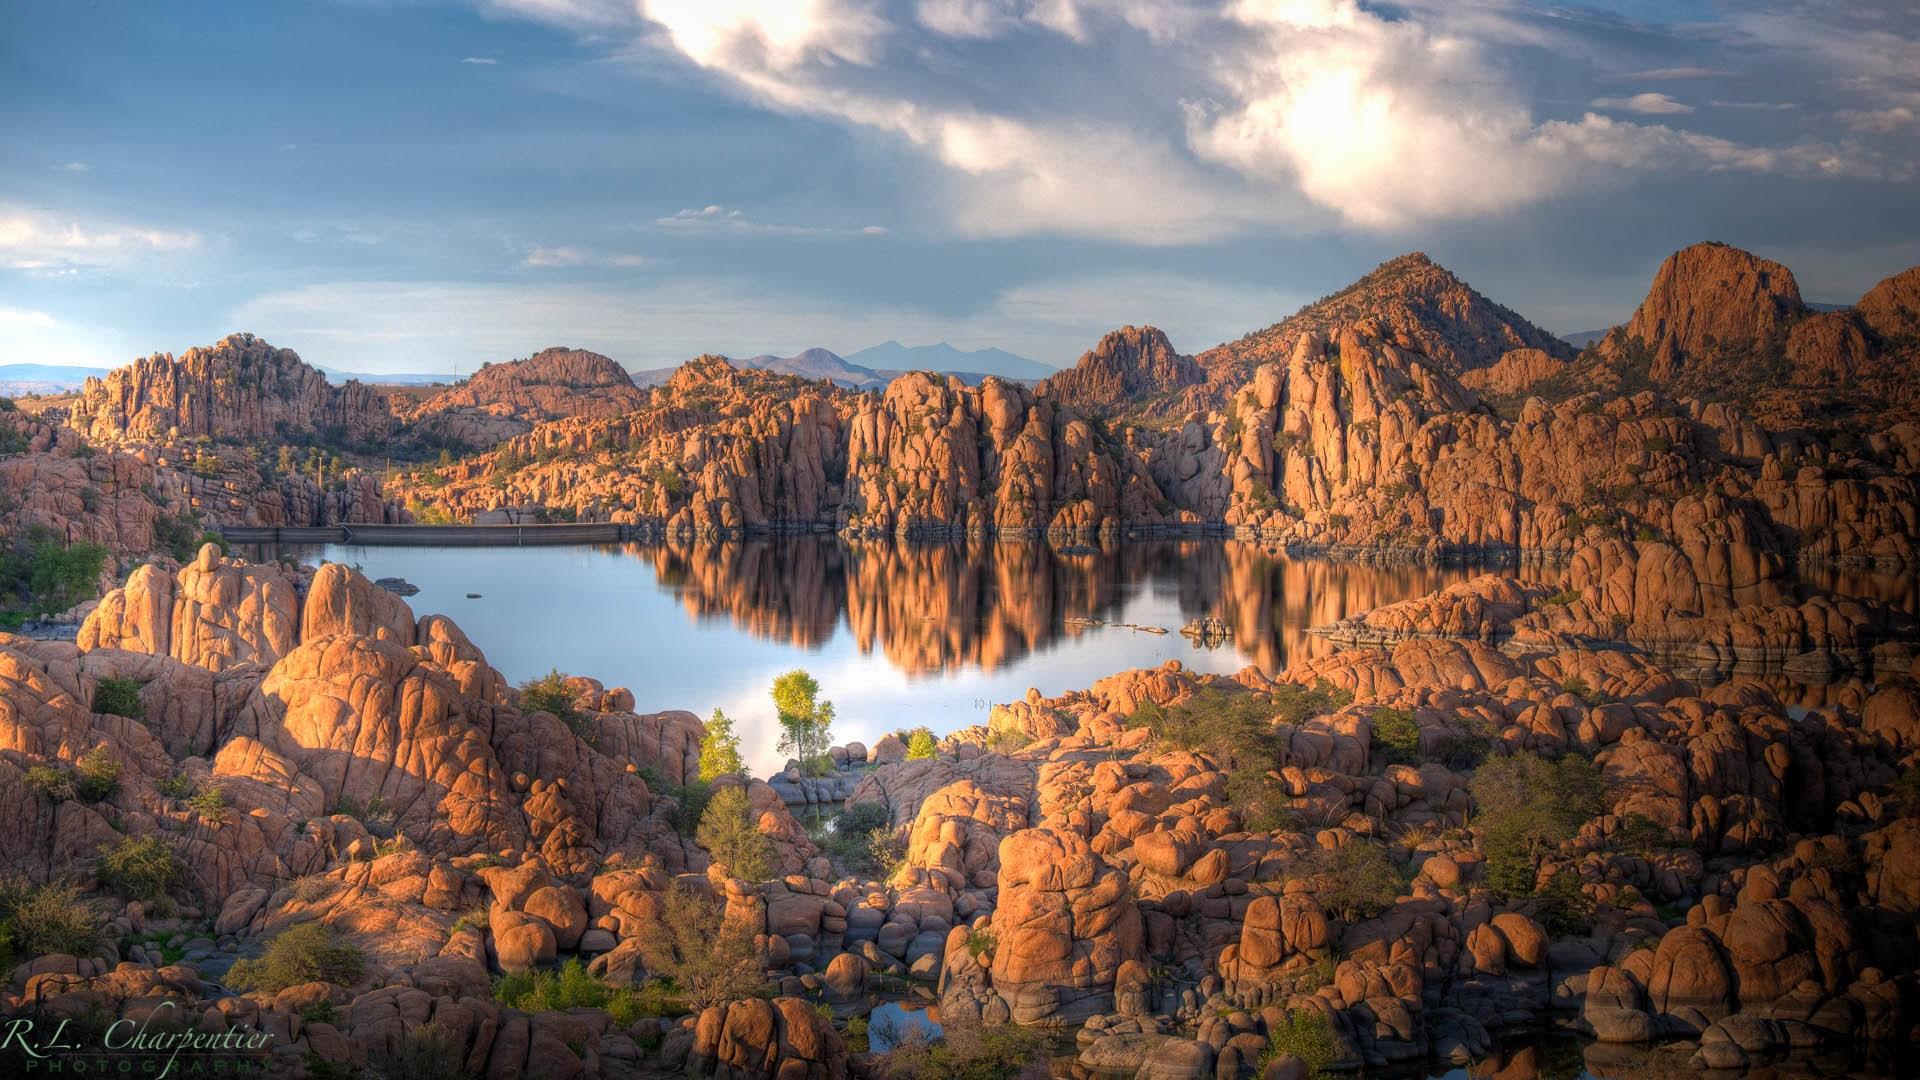 Watson Lake Park in the Granite Dells, Prescott Arizona